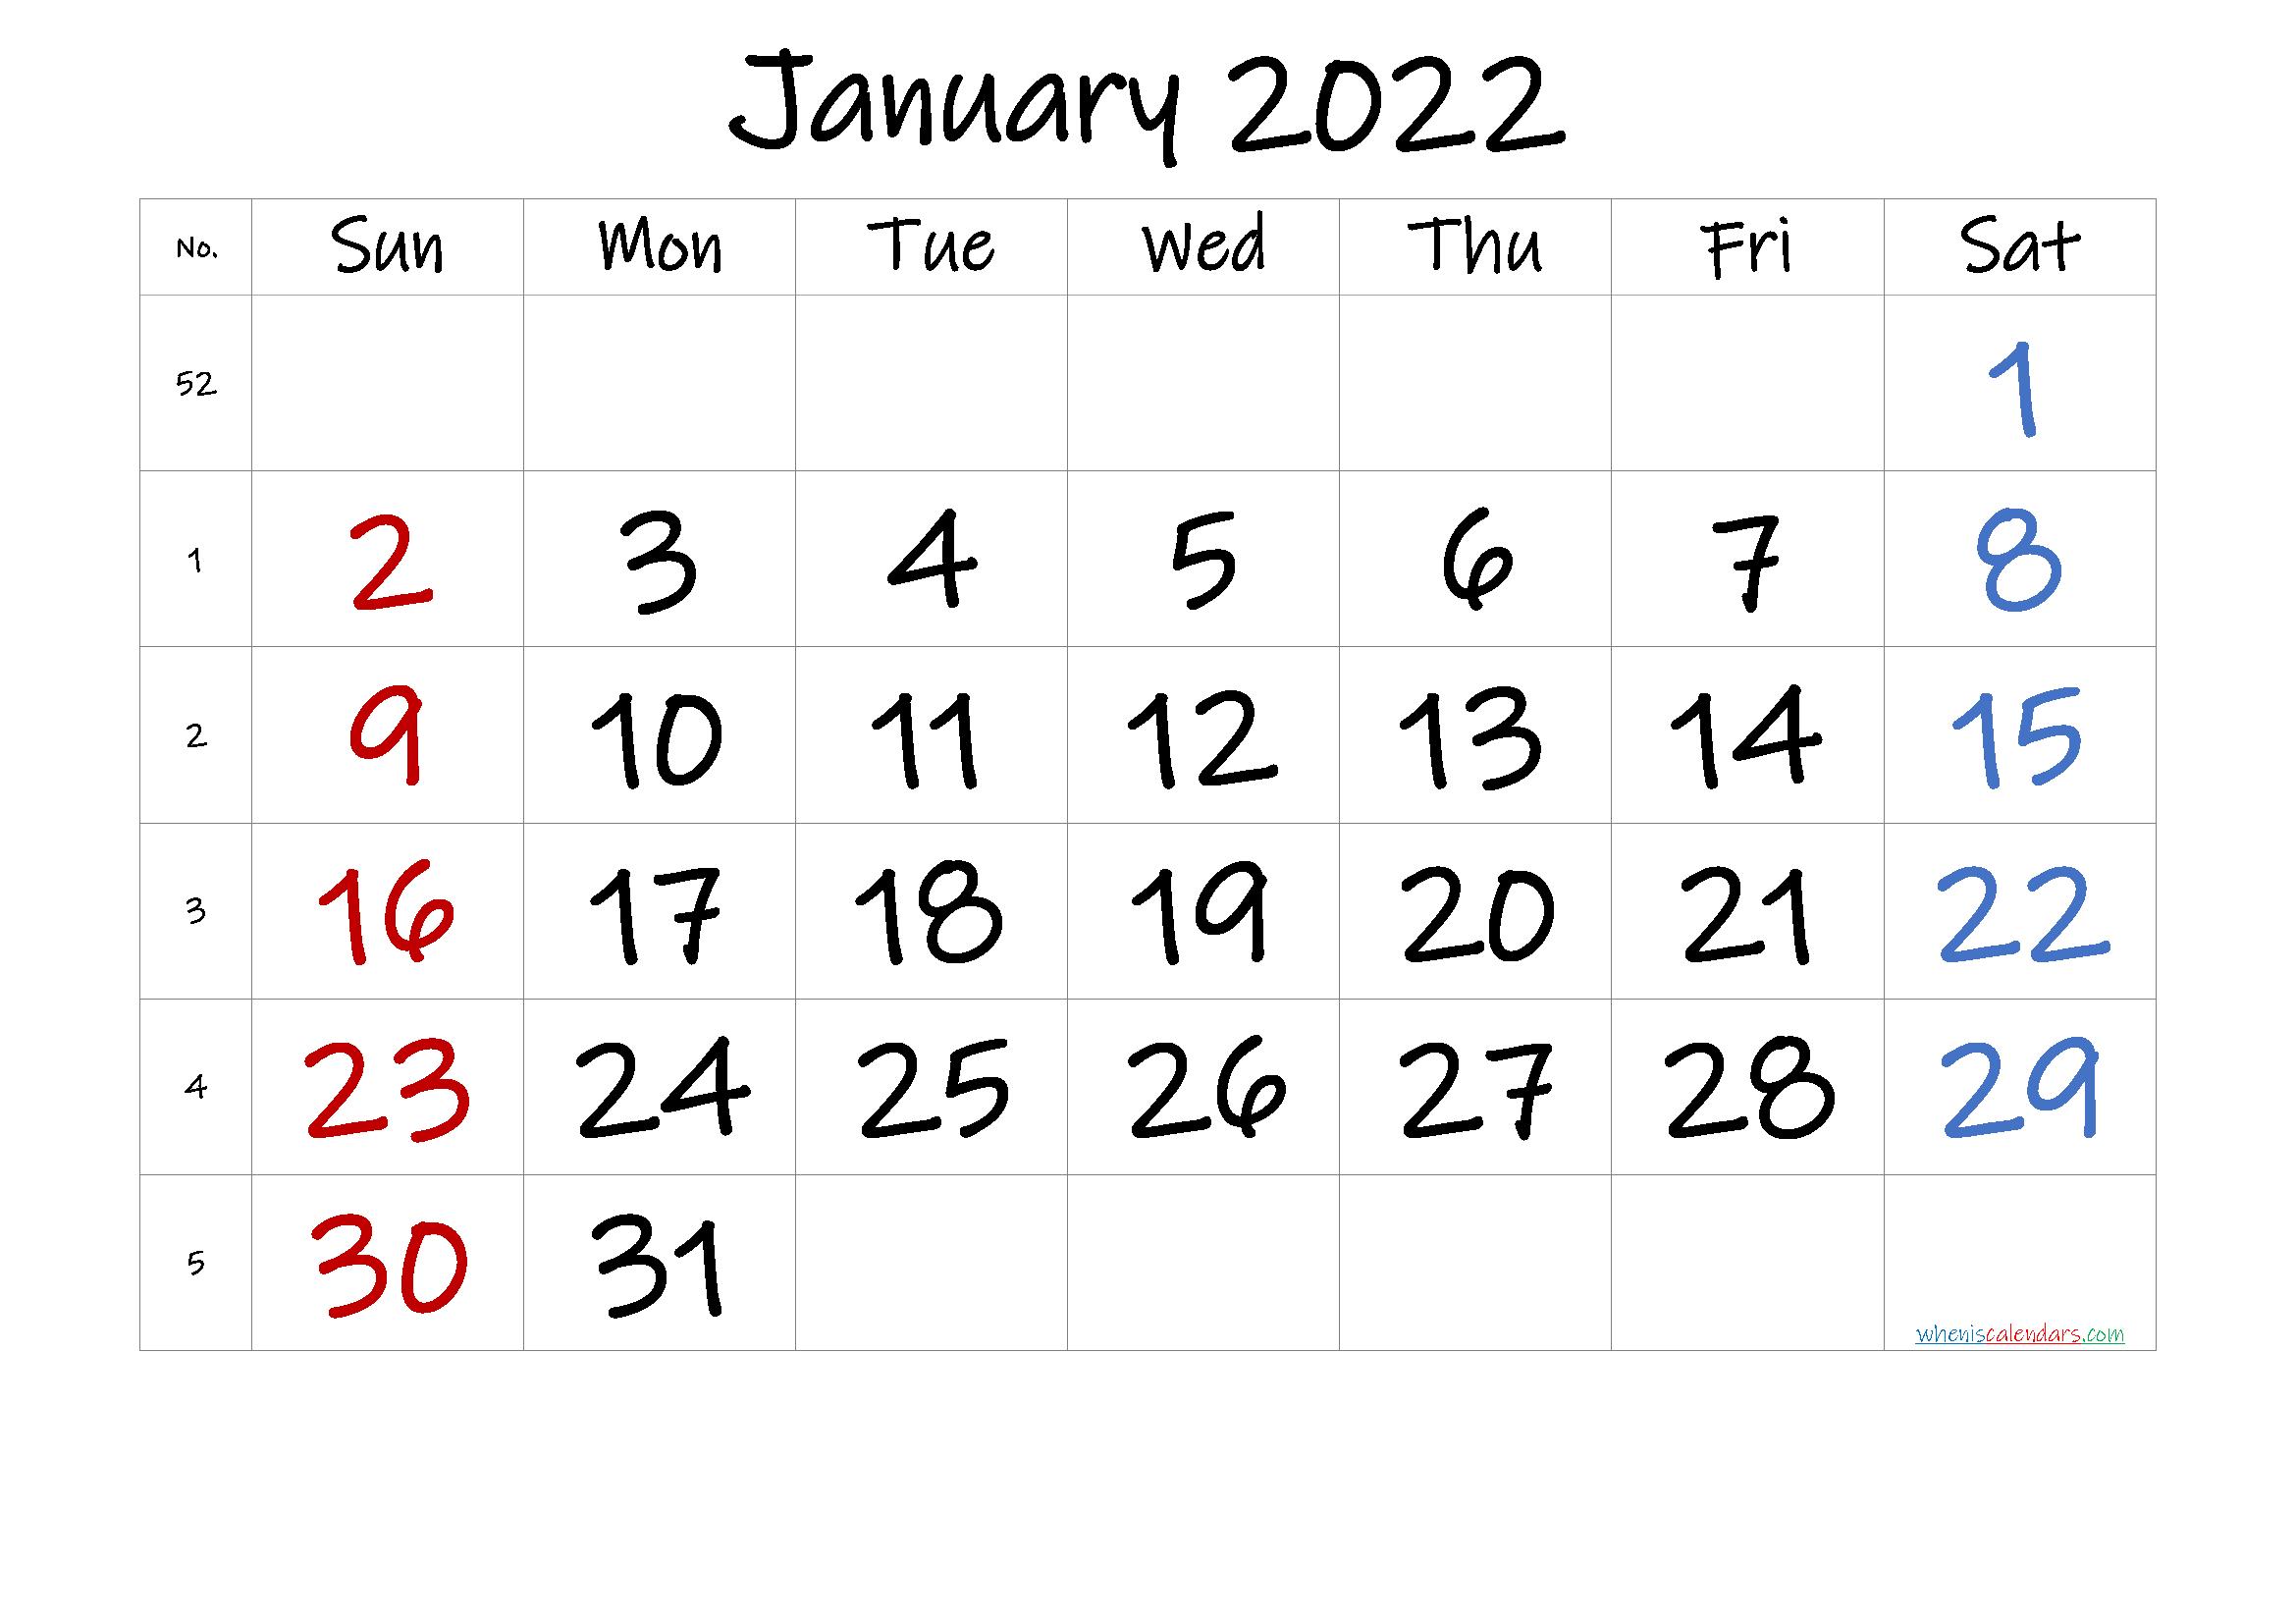 Free January 2022 Calendar